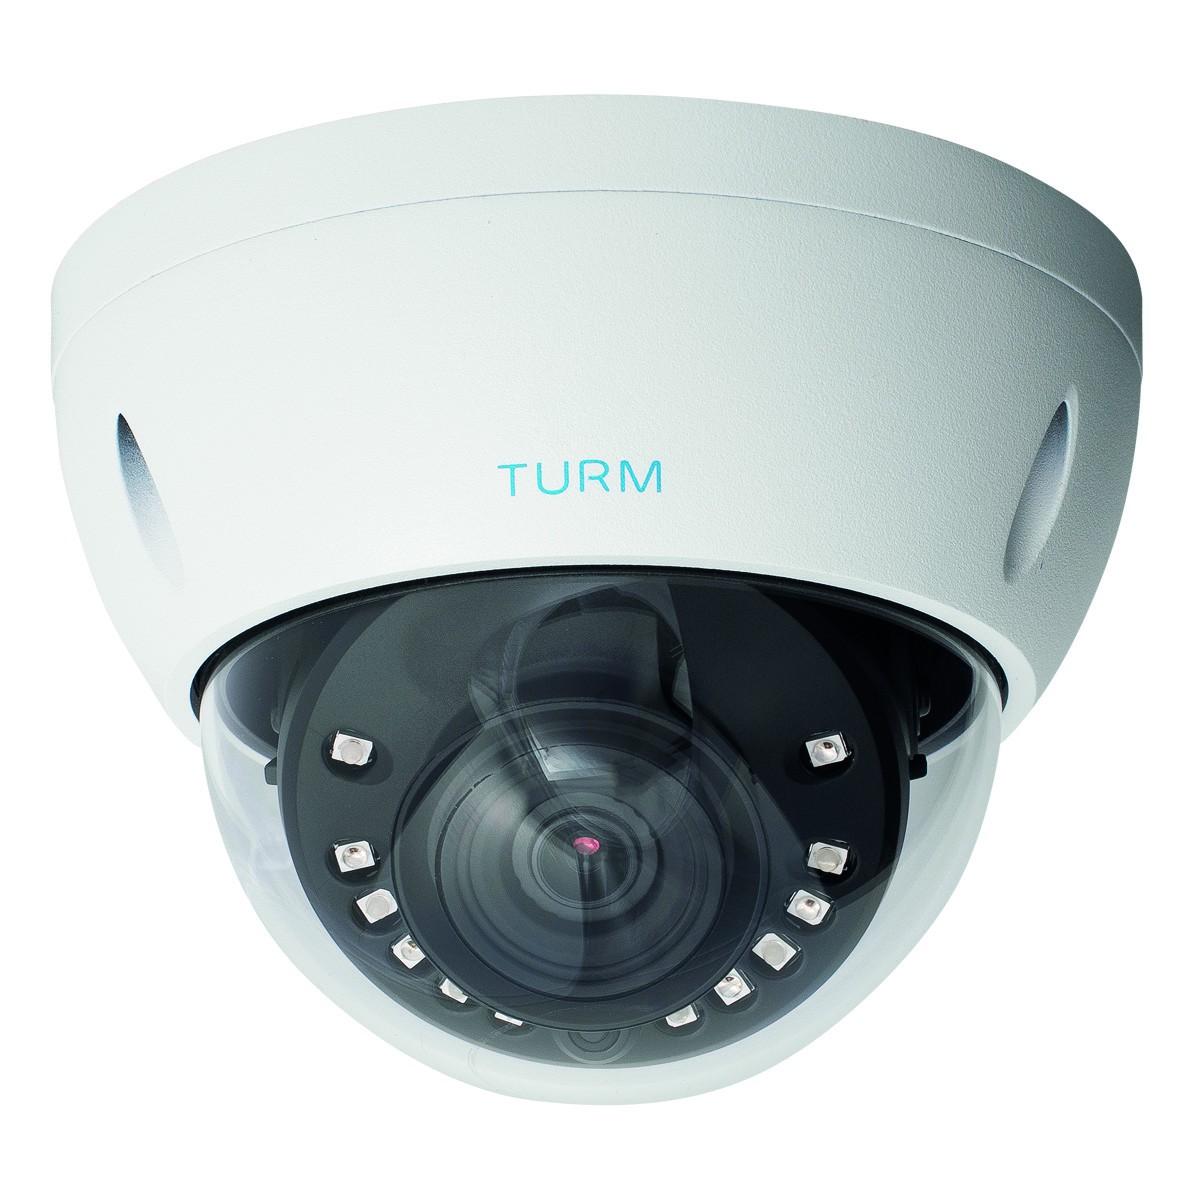 TURM HDCVI Professional 4,1 MP Dome Kamera, 30m Nachtsicht, 2.8mm Objektiv mit 100° Blickwinkel und